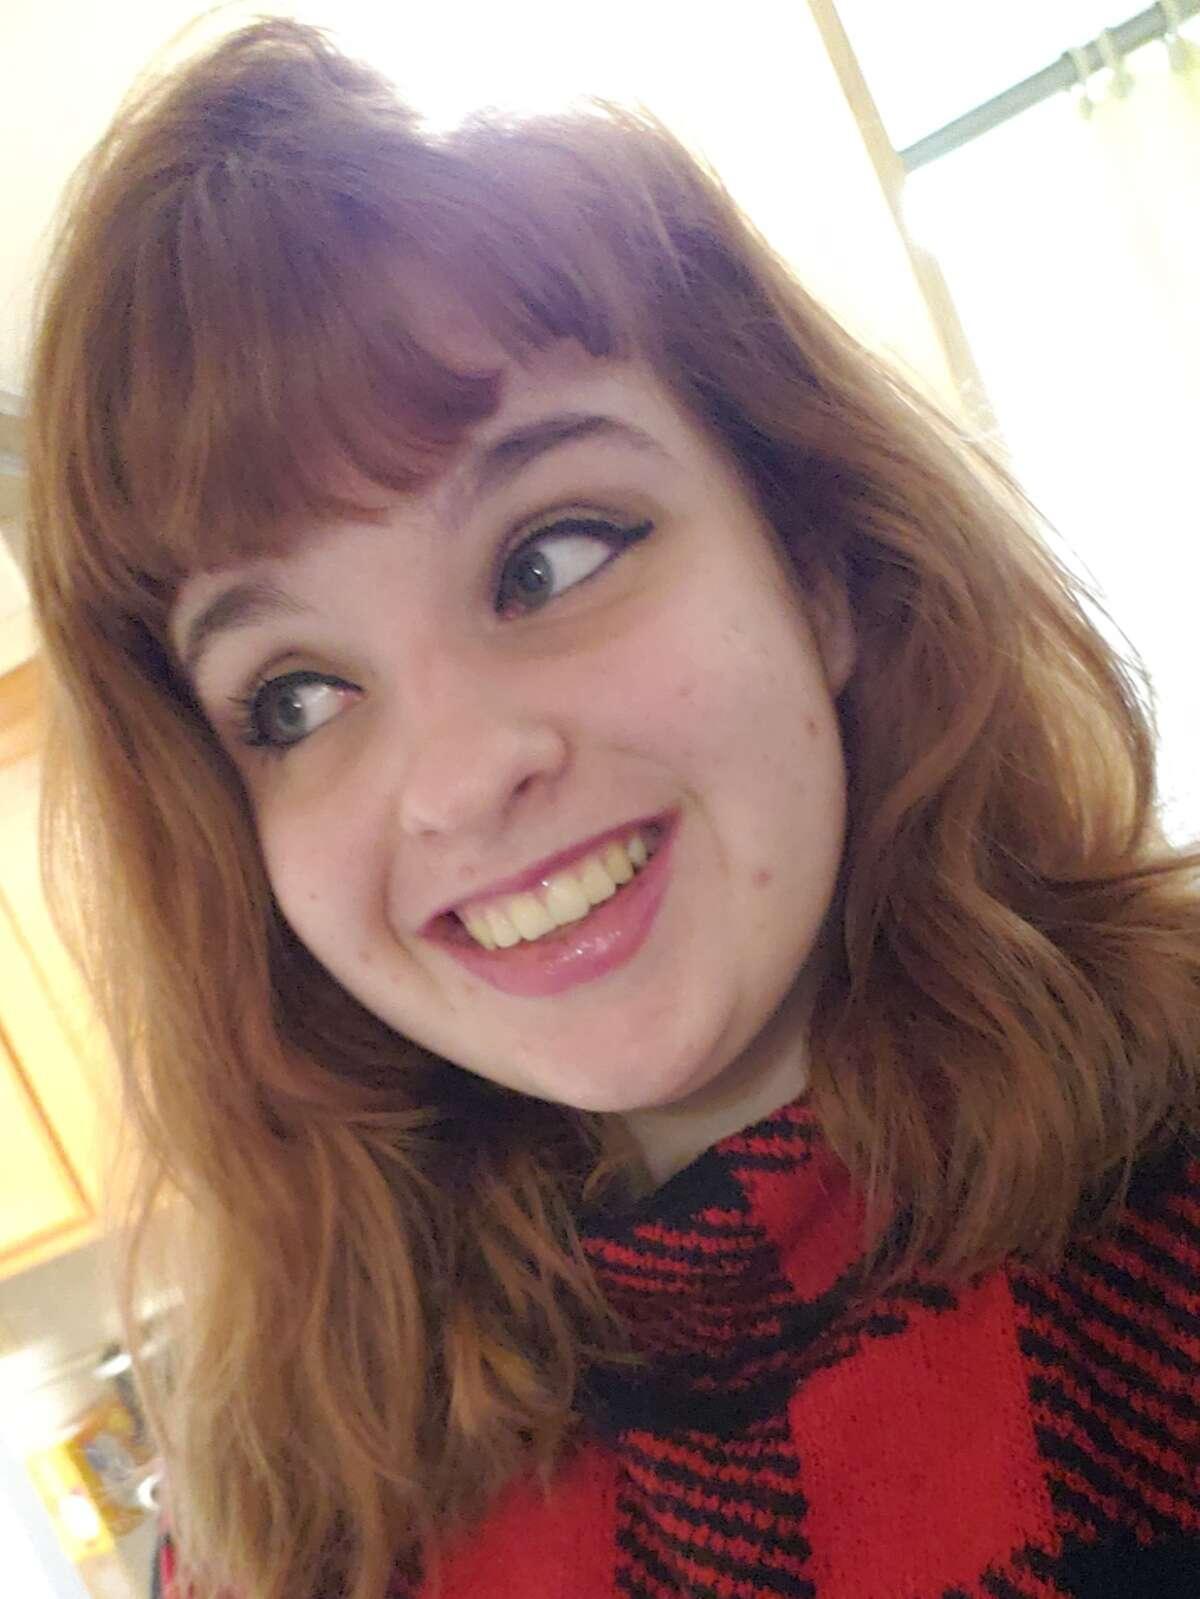 Samantha Zimmerman, managing editor of the project